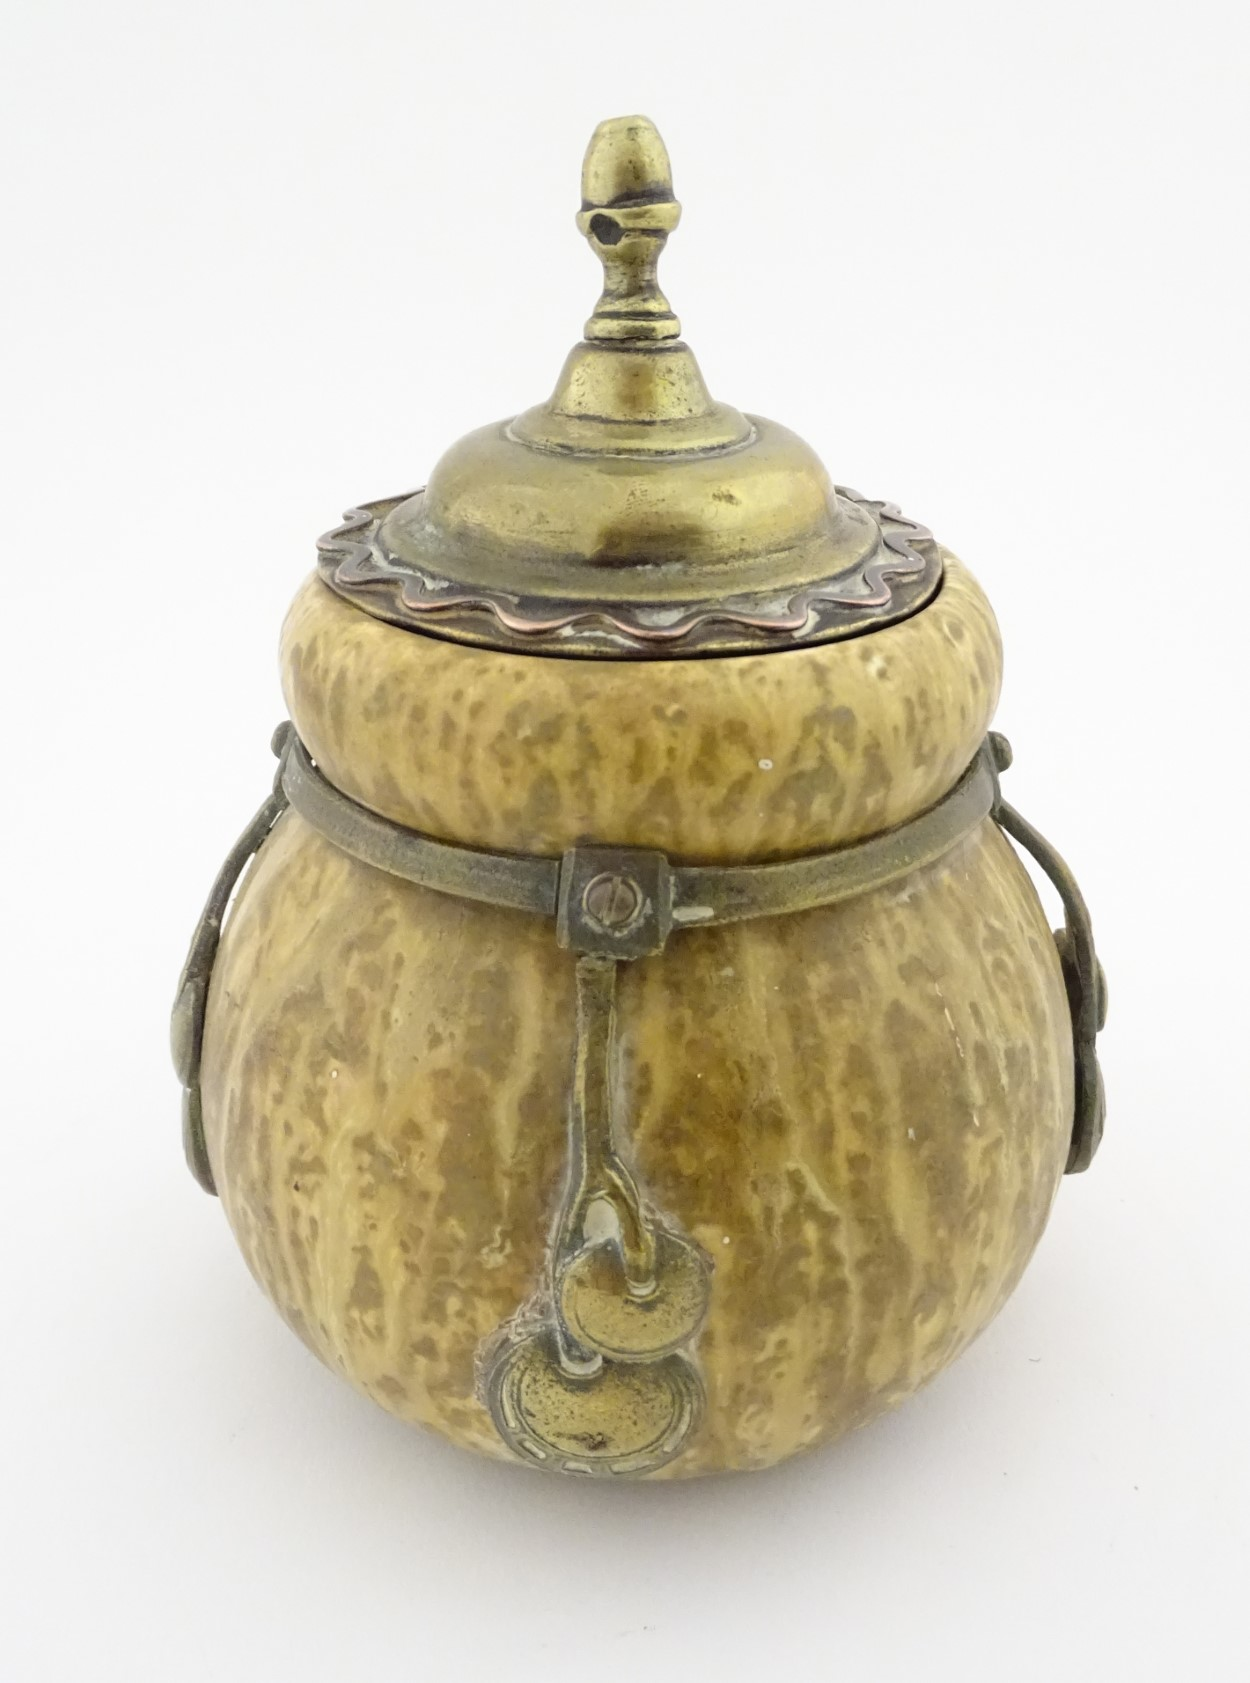 Lot 59 - A Continental Amphora gourd shaped pot, glazed in mottled cream glazes,